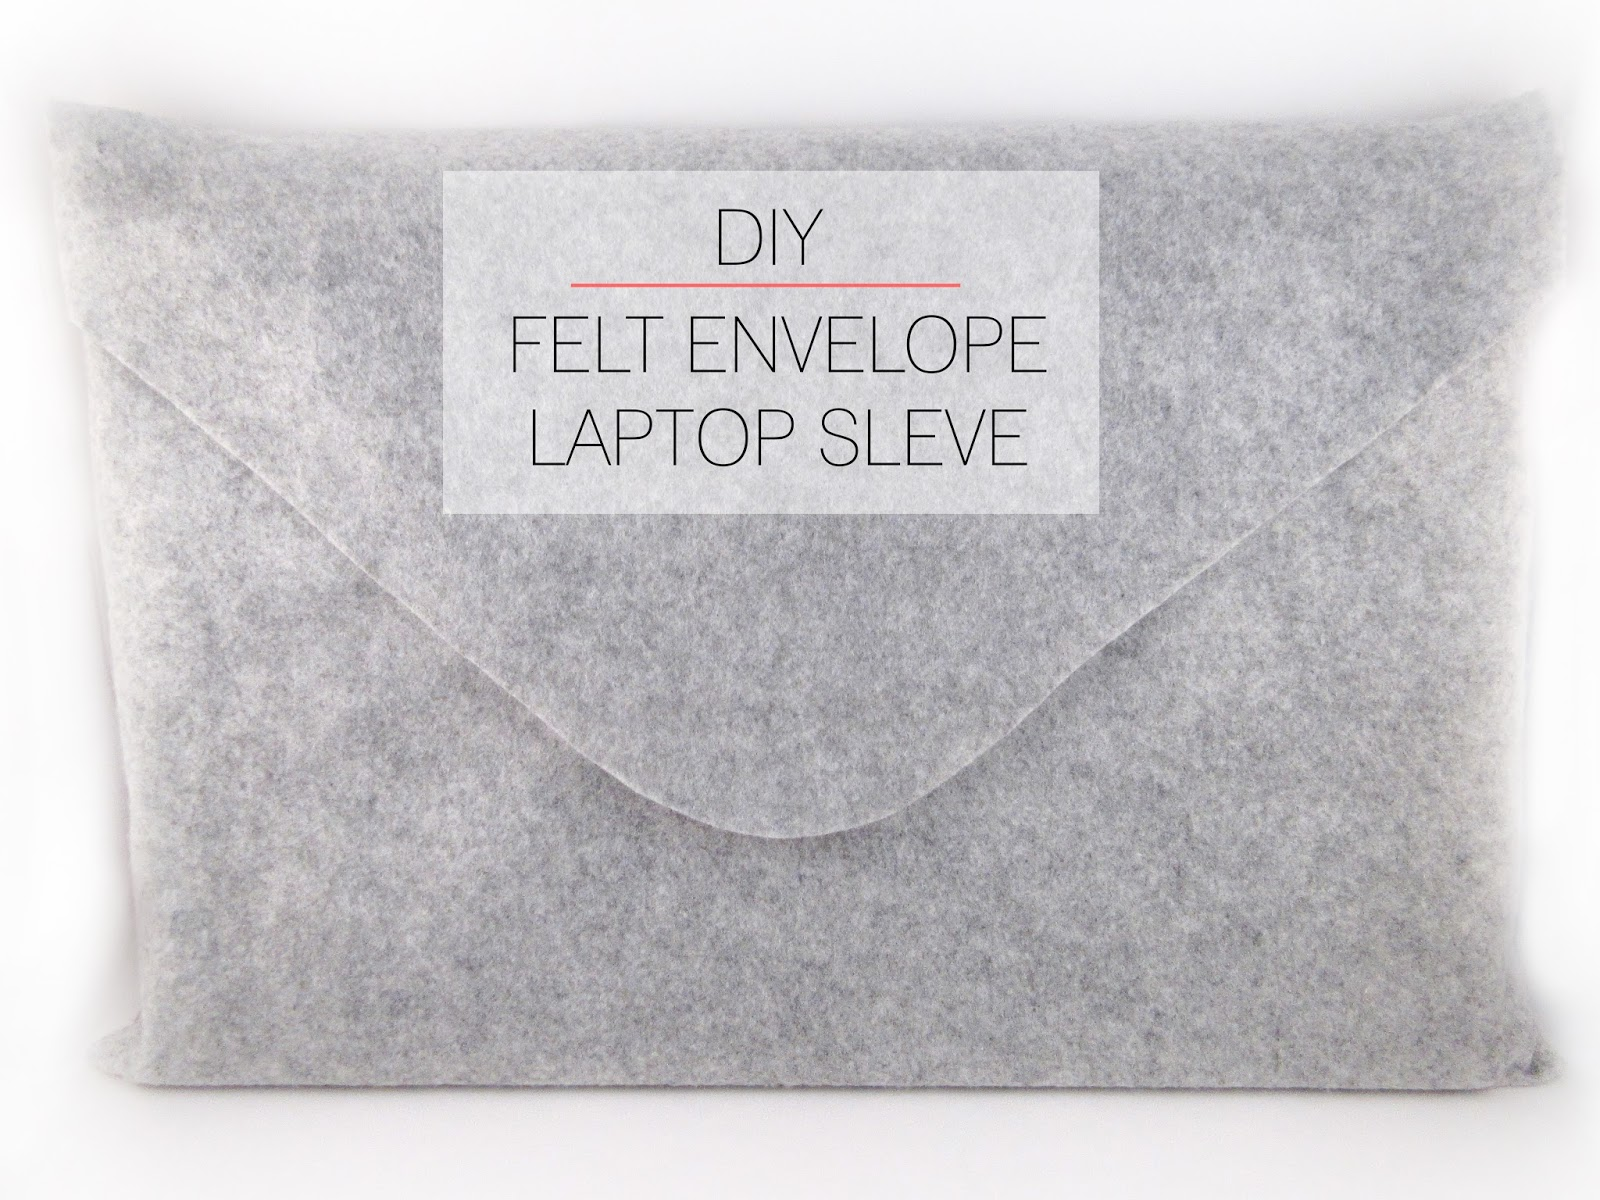 Cafe Craftea: DIY   Felt Envelope Laptop Sleeve